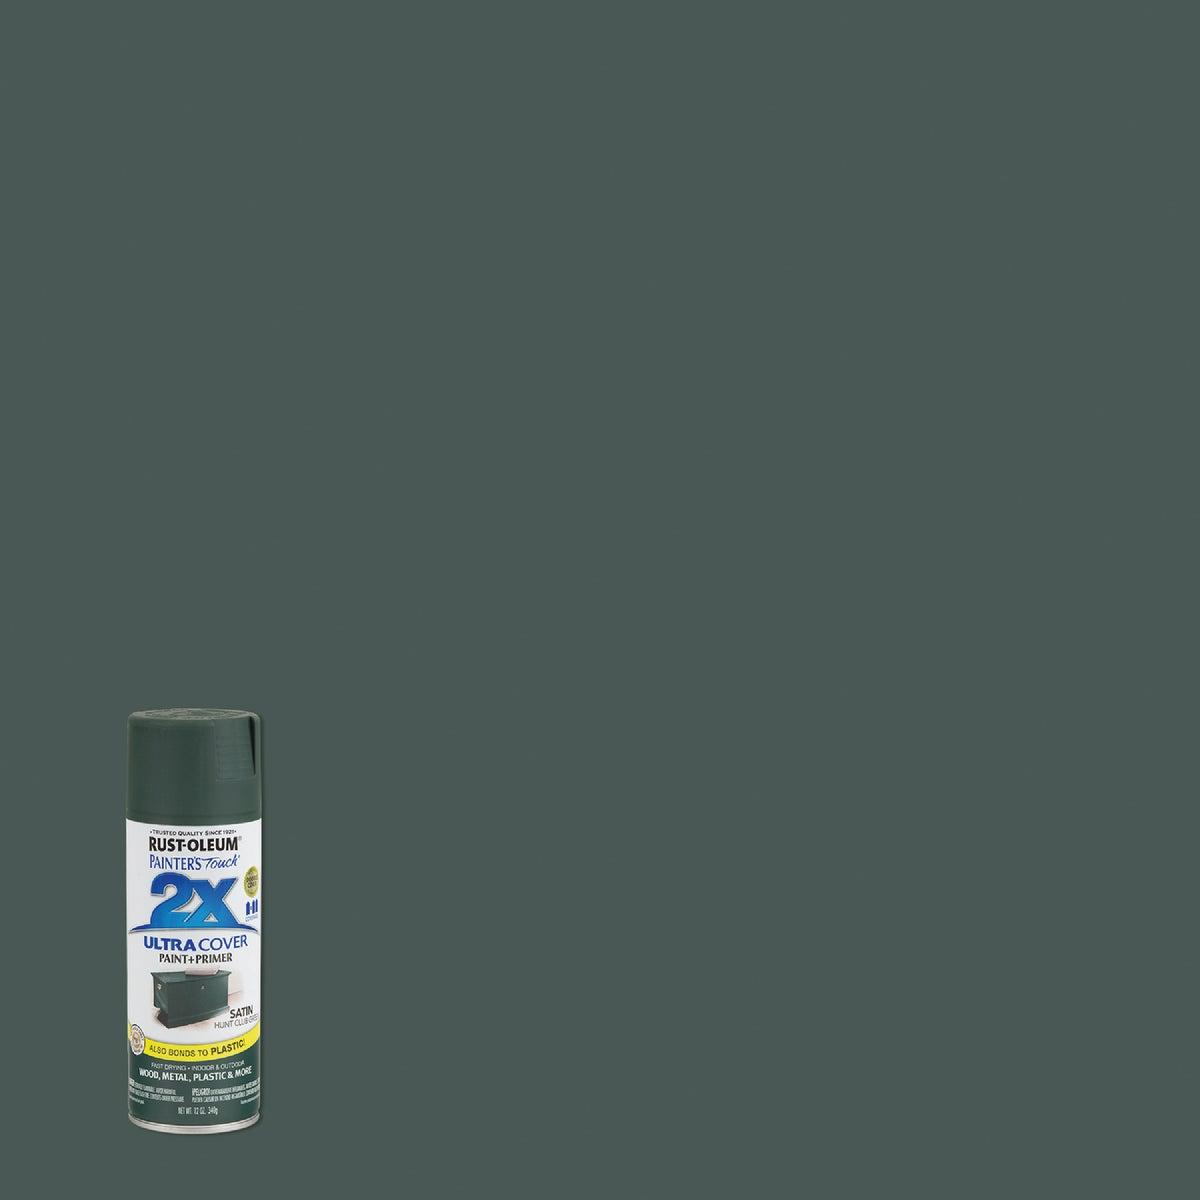 SAT HC GRN SPRAY PAINT - 249074 by Rustoleum